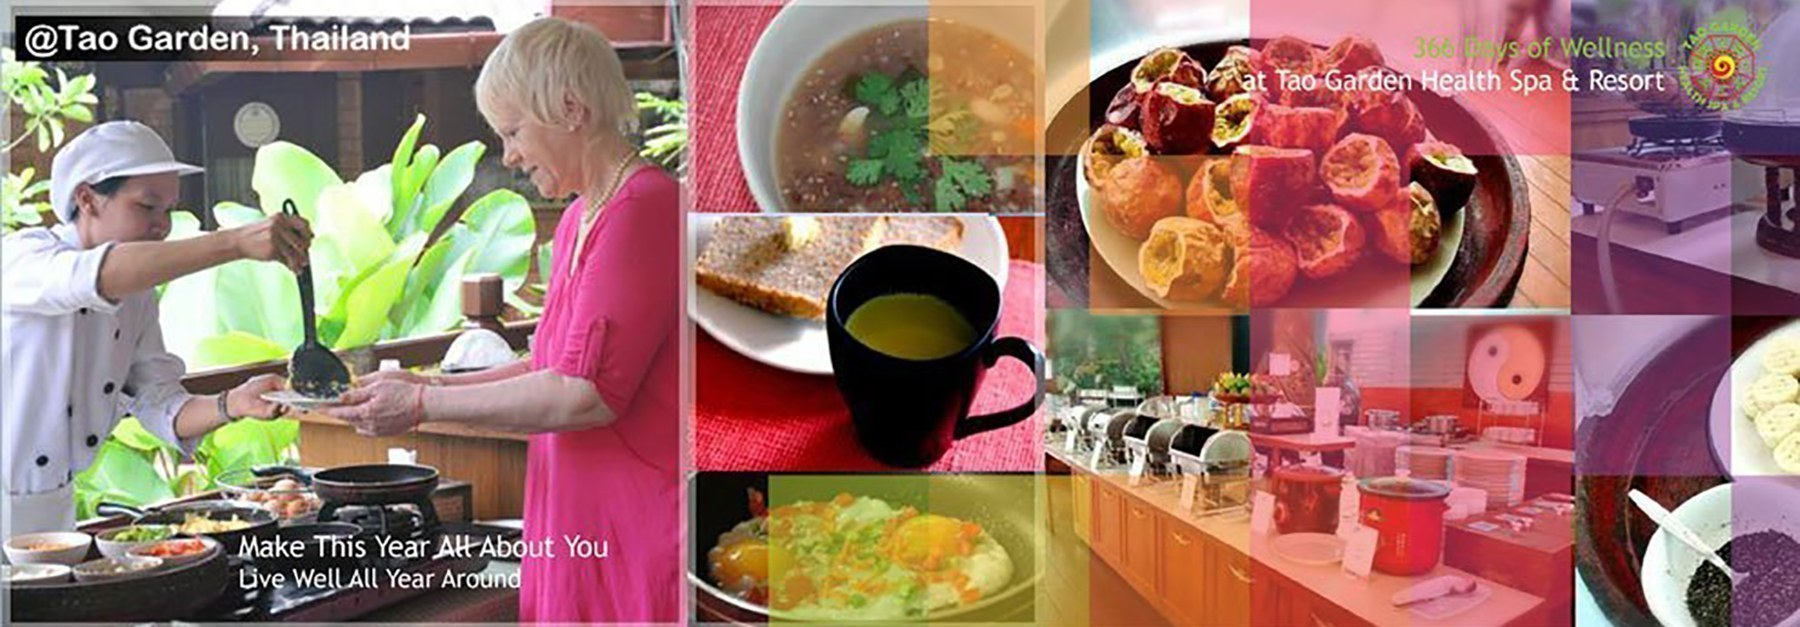 Live Well All Year Around – Tao Garden Organic Food